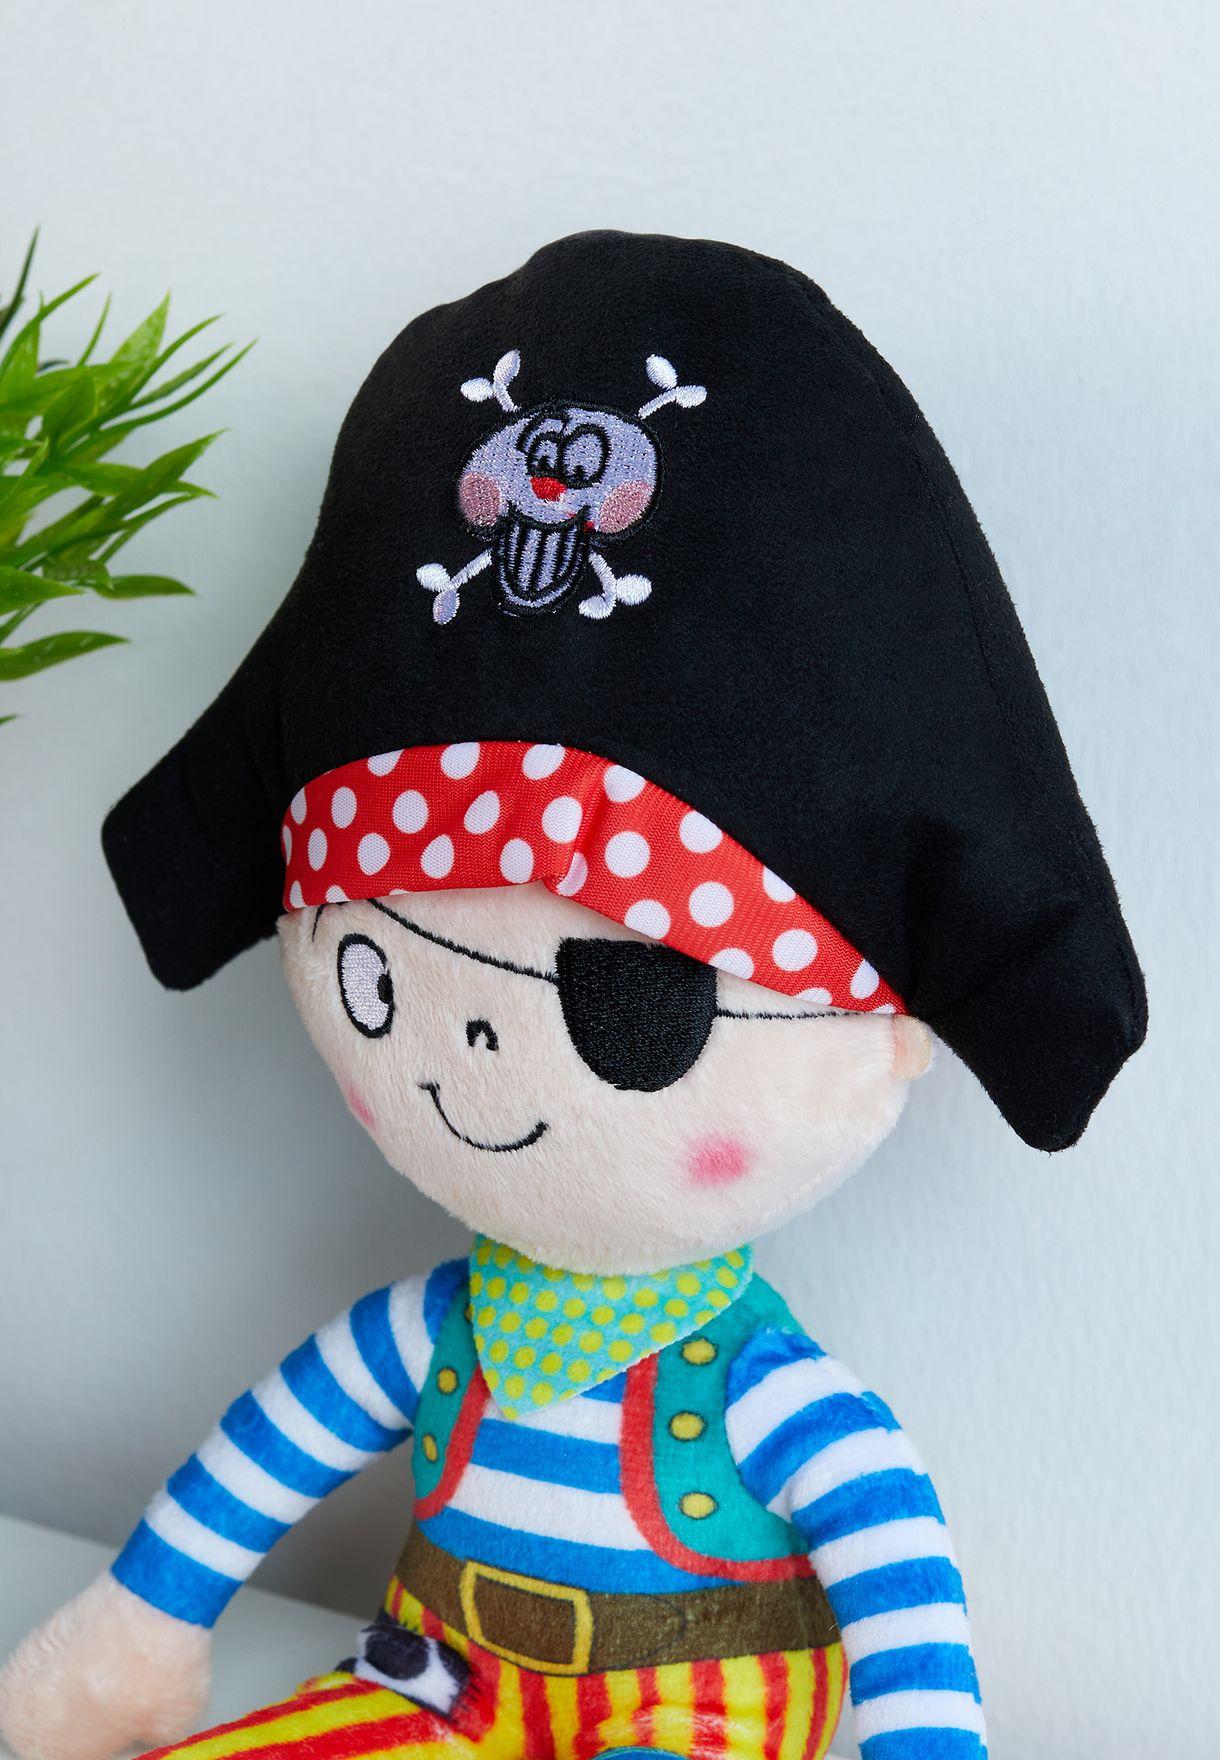 Captain Pilchard Plush Toy